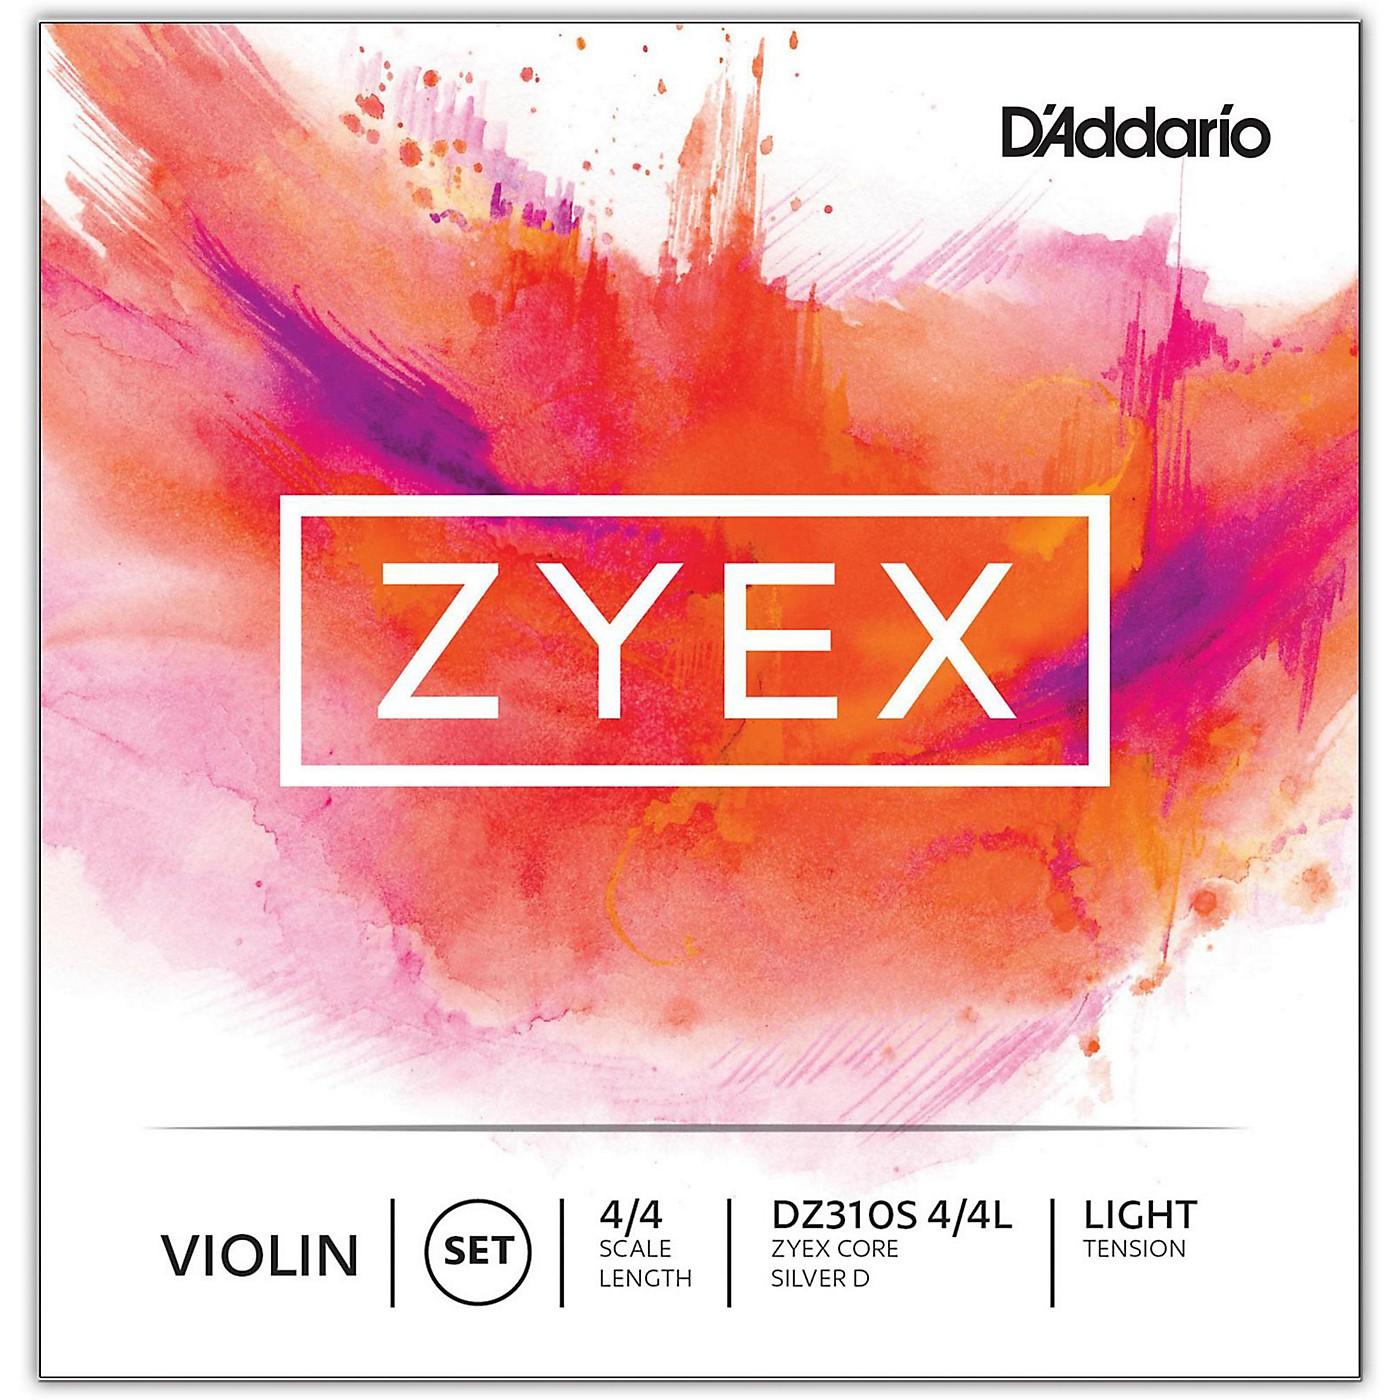 D'Addario Zyex Series Violin String Set thumbnail